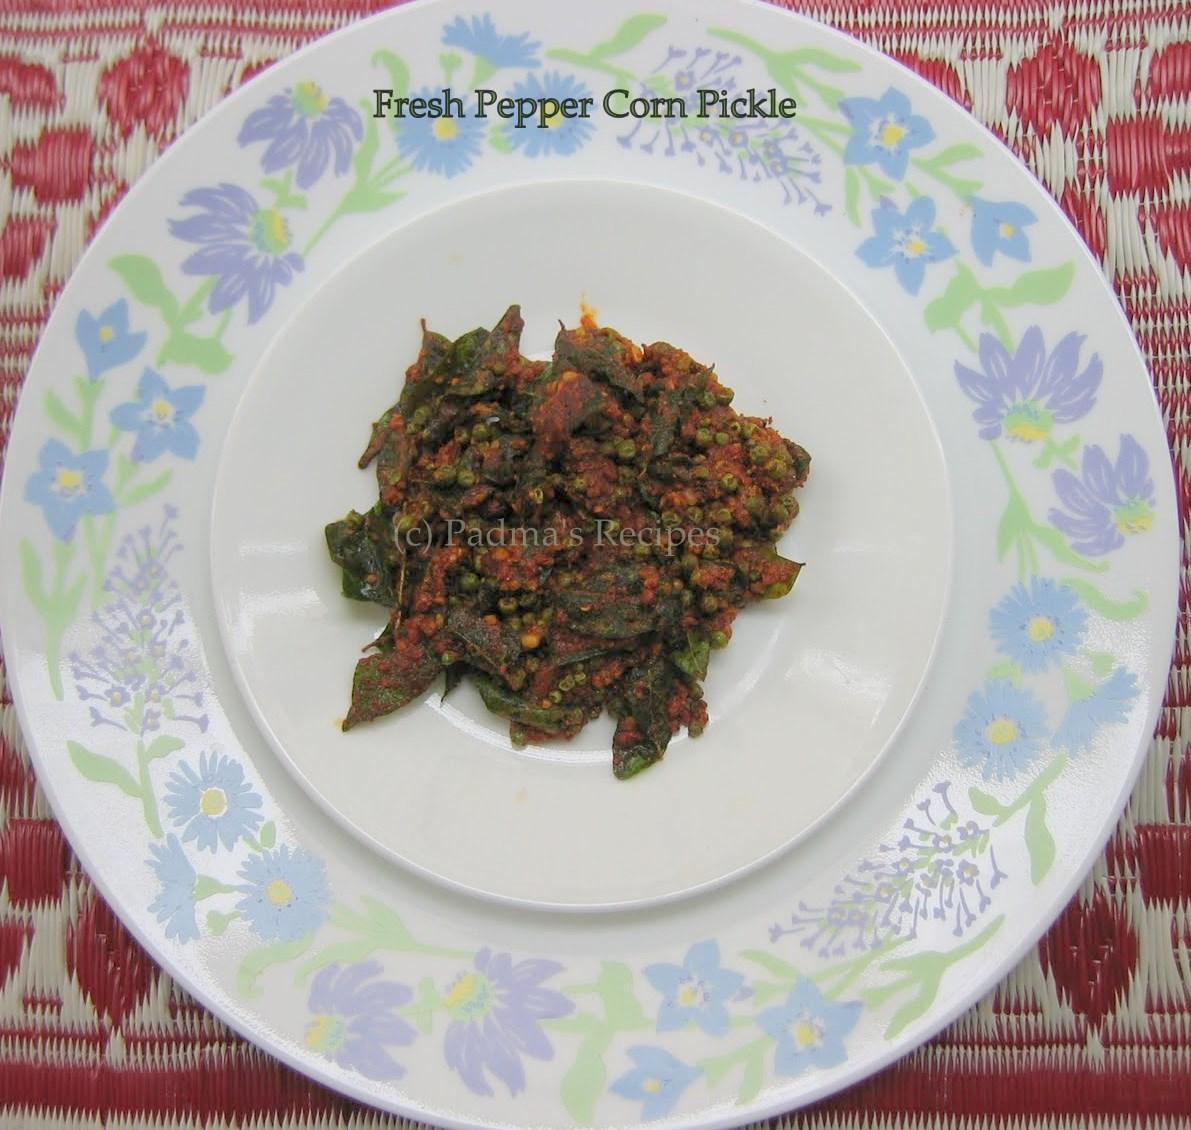 Pepper Corns Good In What Food